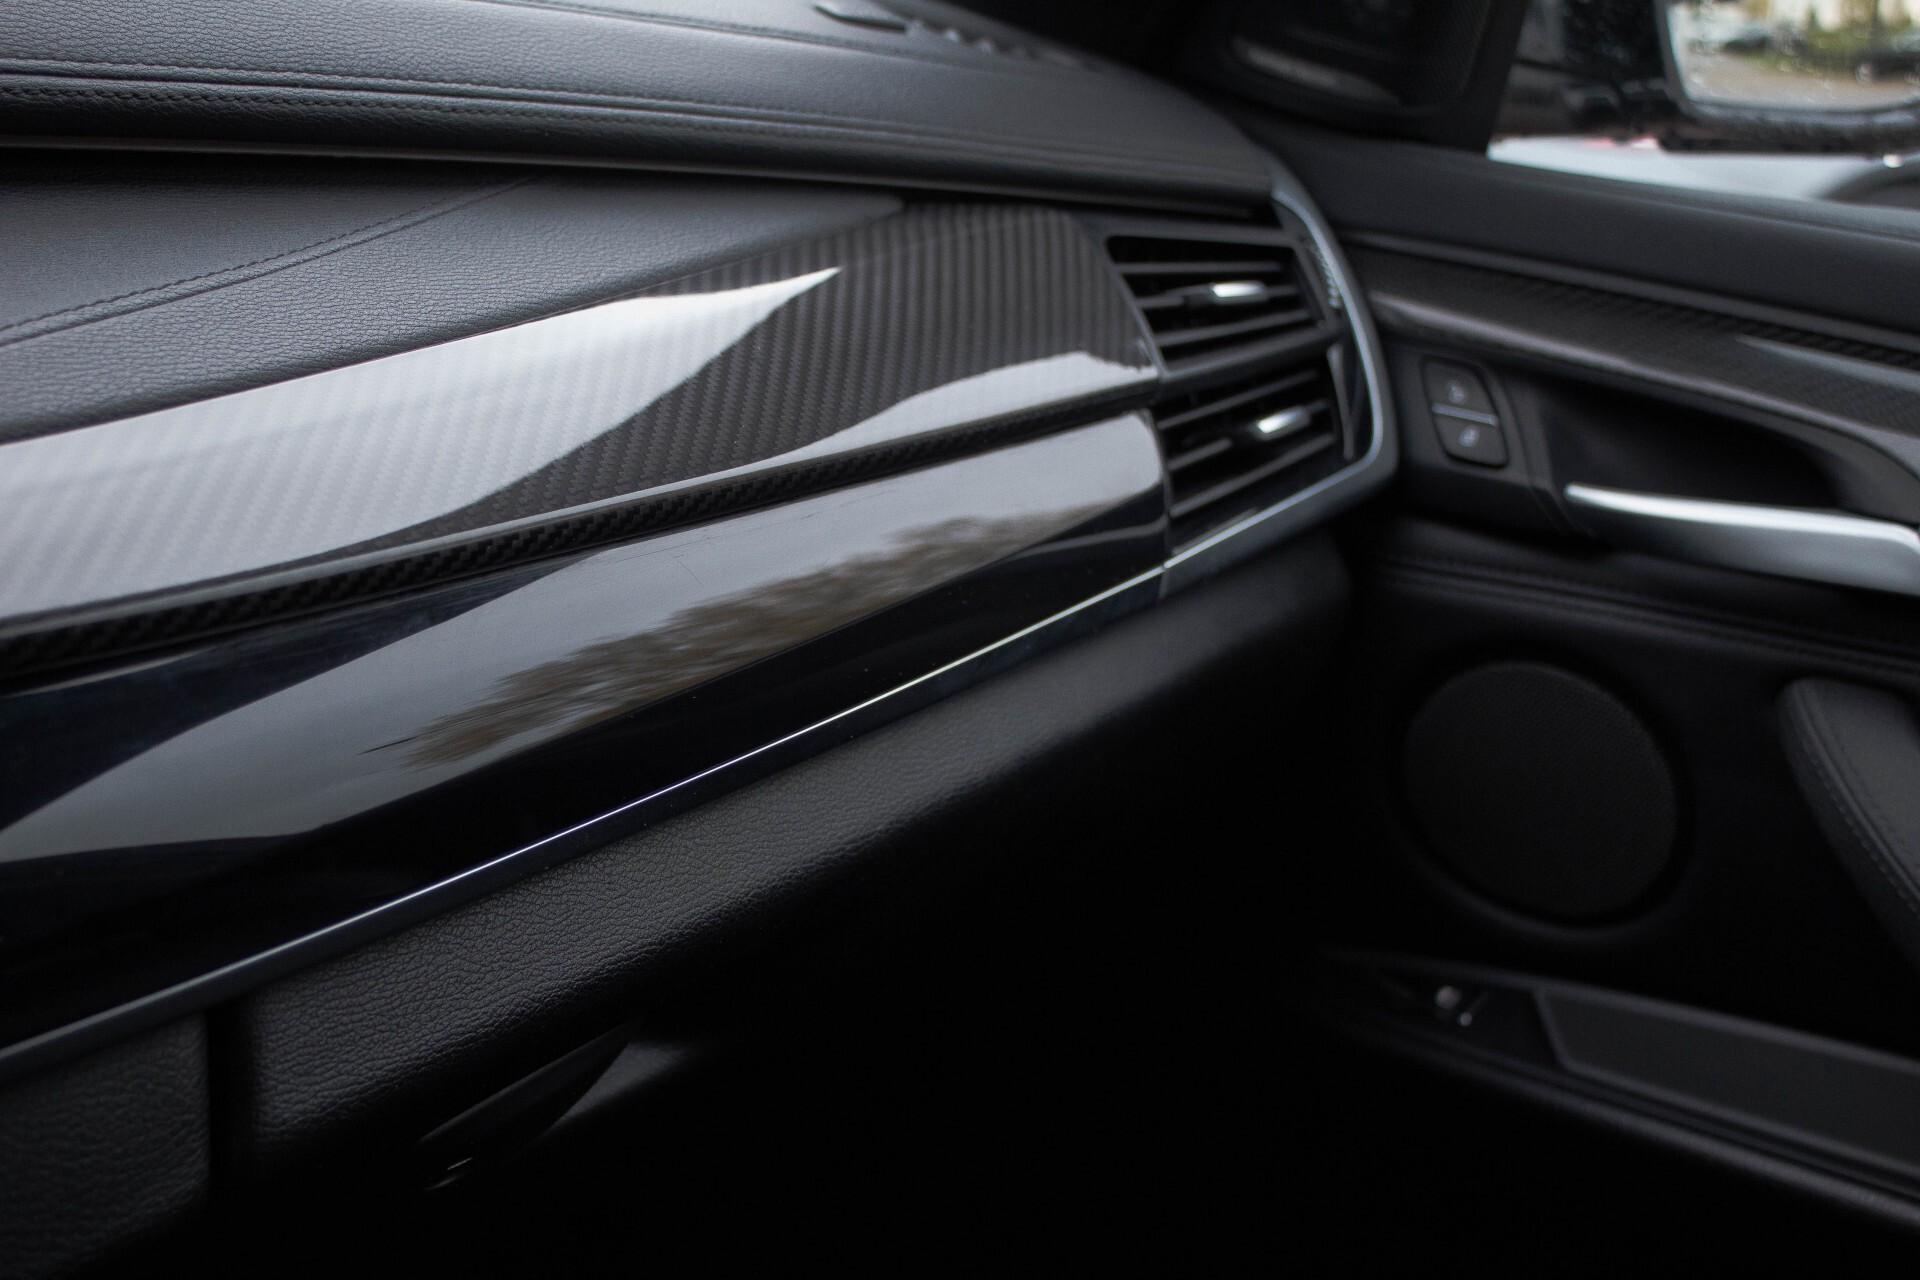 BMW X6 5.0d M Adaptive Drive/Comfortacces/Softclose/Adaptive Cruise/Standkachel/360camera/HUD/DAB Aut8 Foto 29